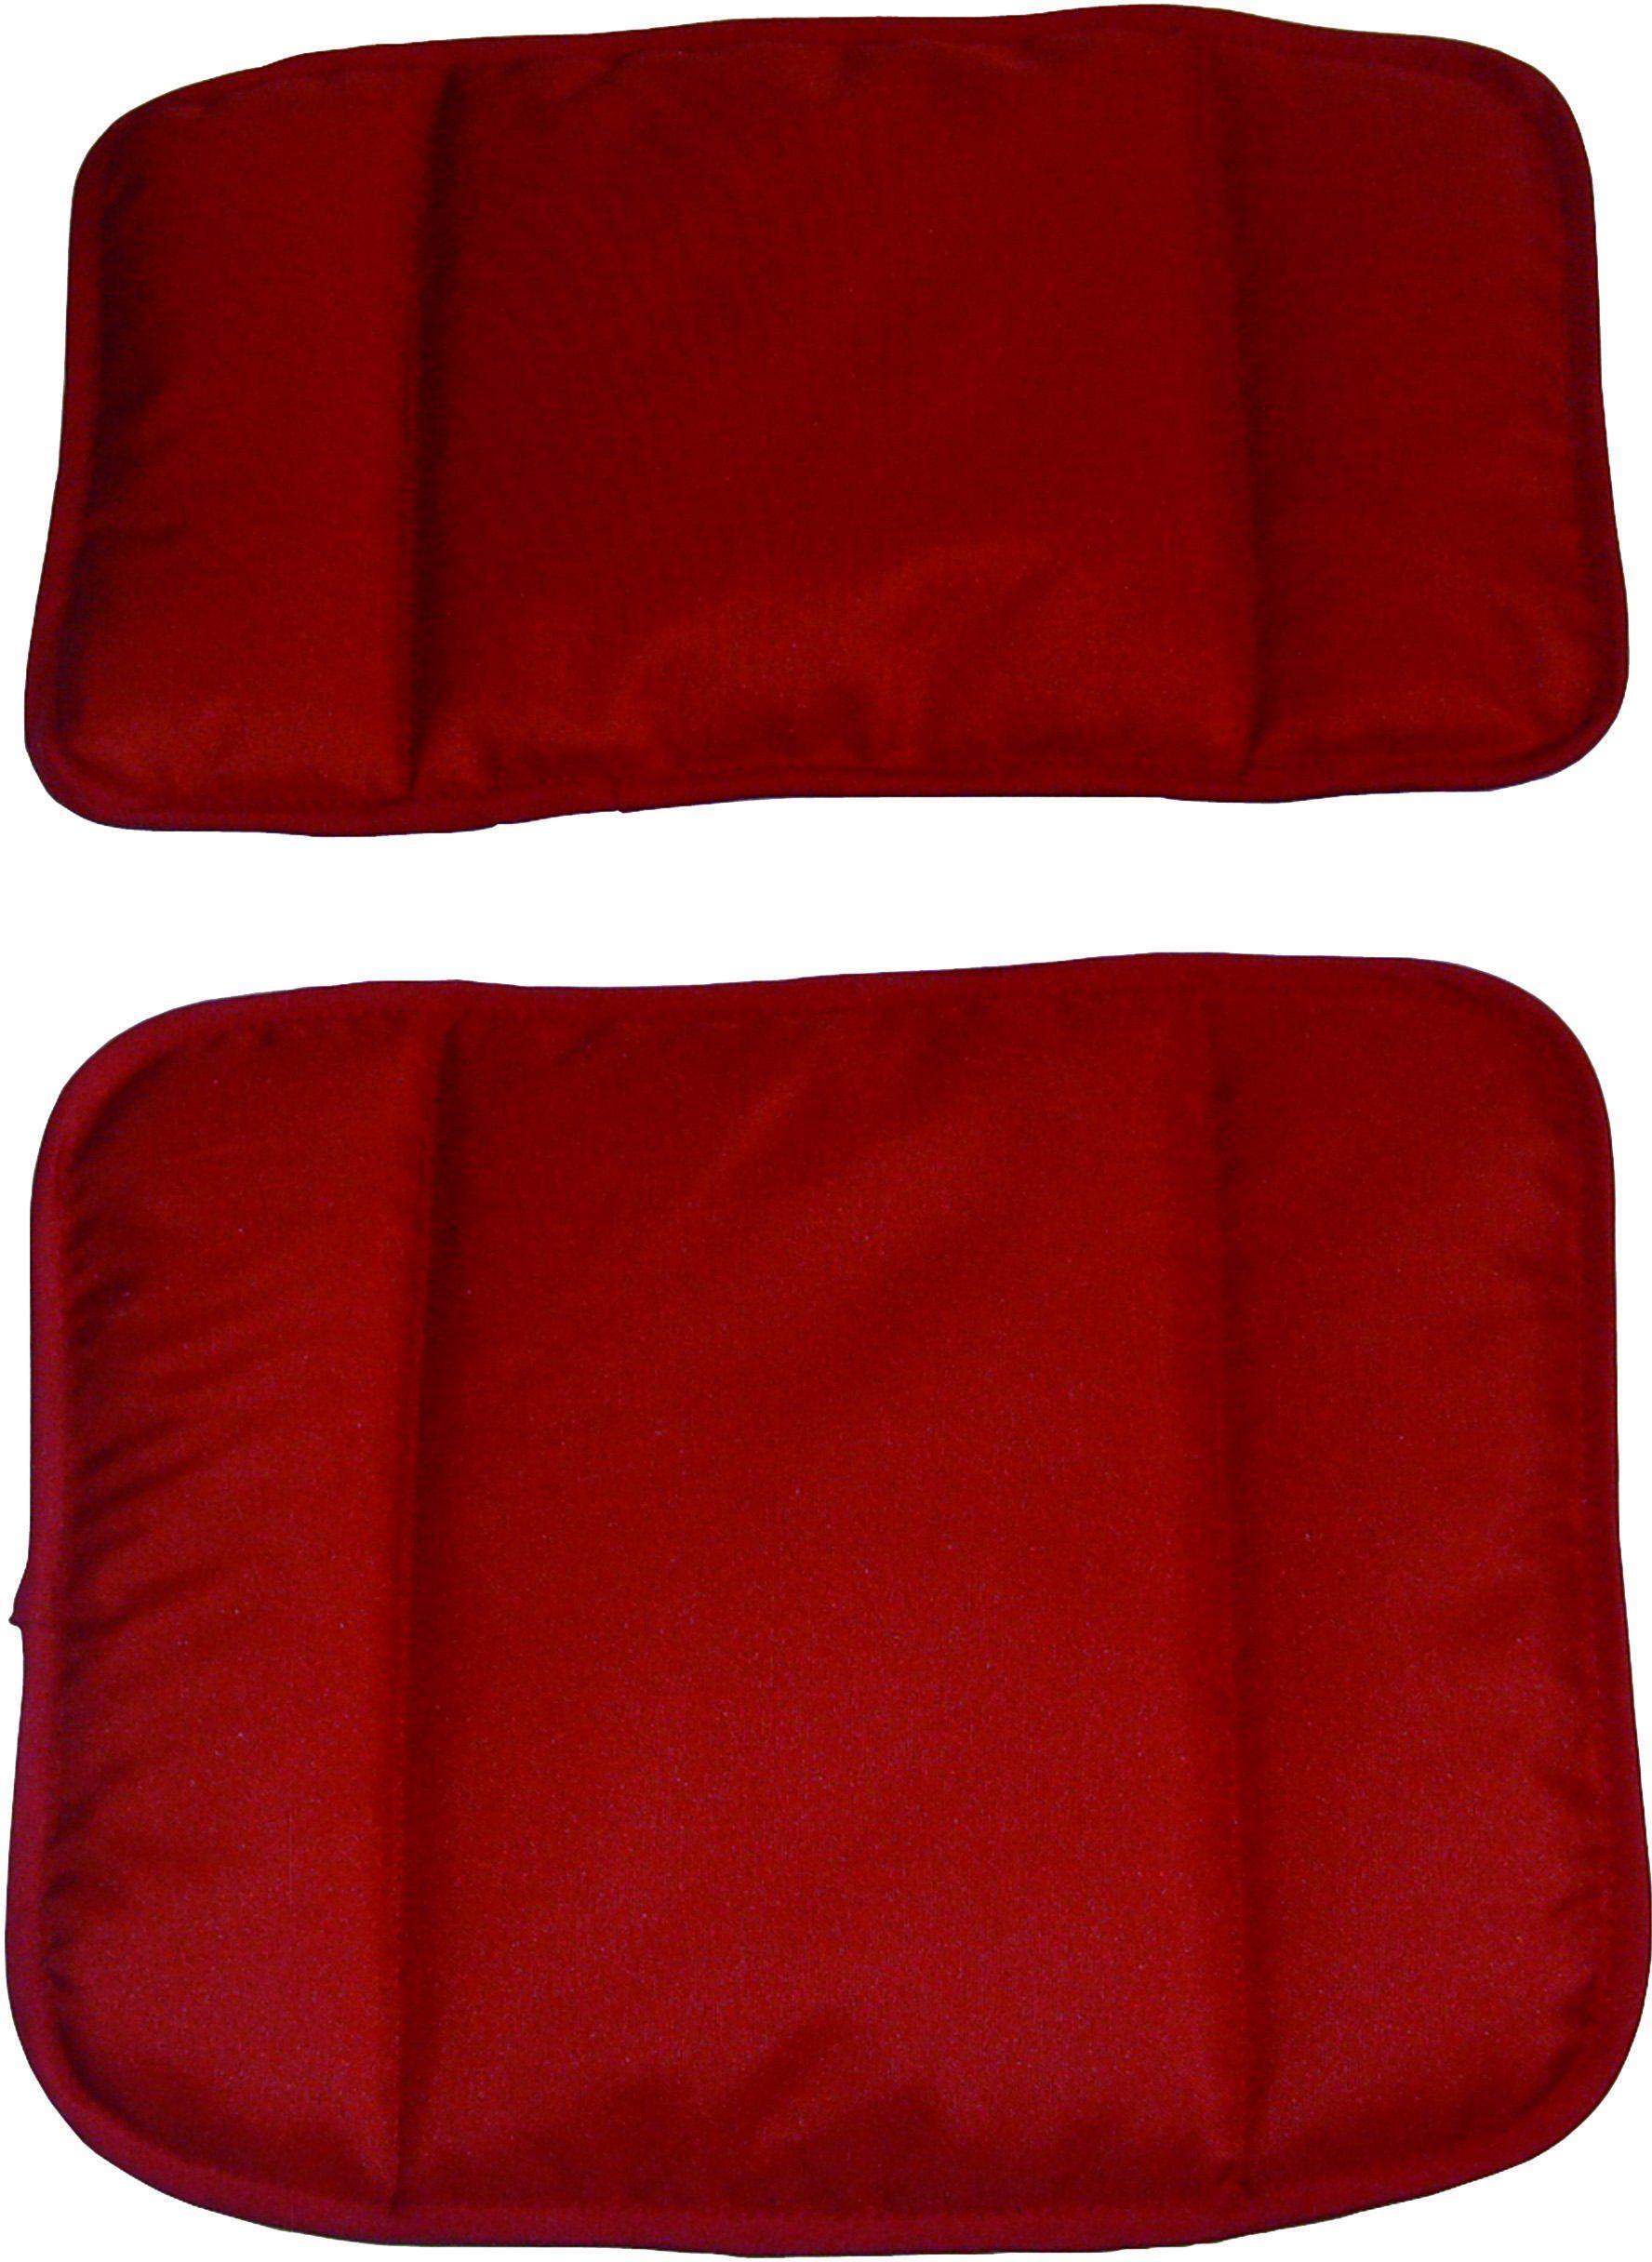 Roba Sitzverkleinerer, »Sattes Rot, 2-teilig«